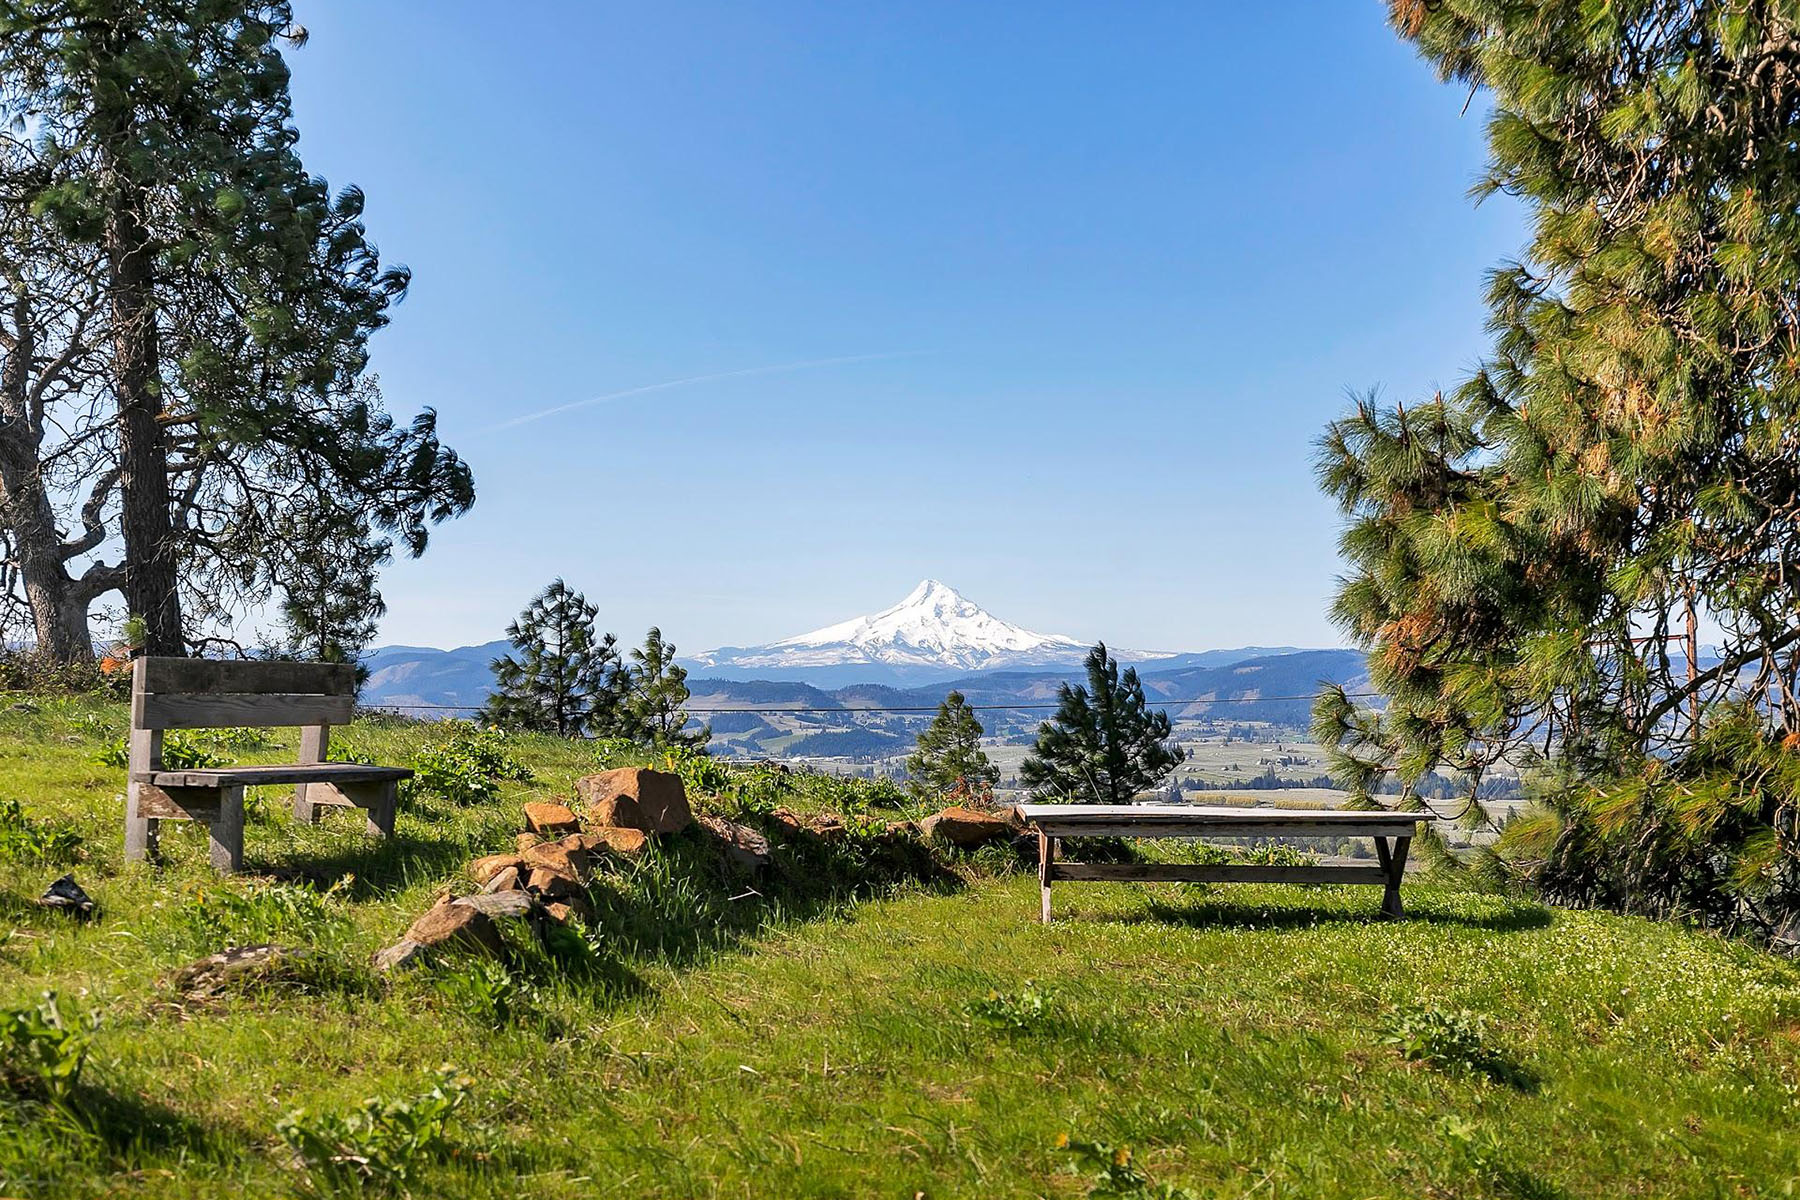 Land for Active at 2312 Balsamroot DR 9 Hood River, OR 97031 2312 Balsamroot DR 9 Hood River, Oregon 97031 United States